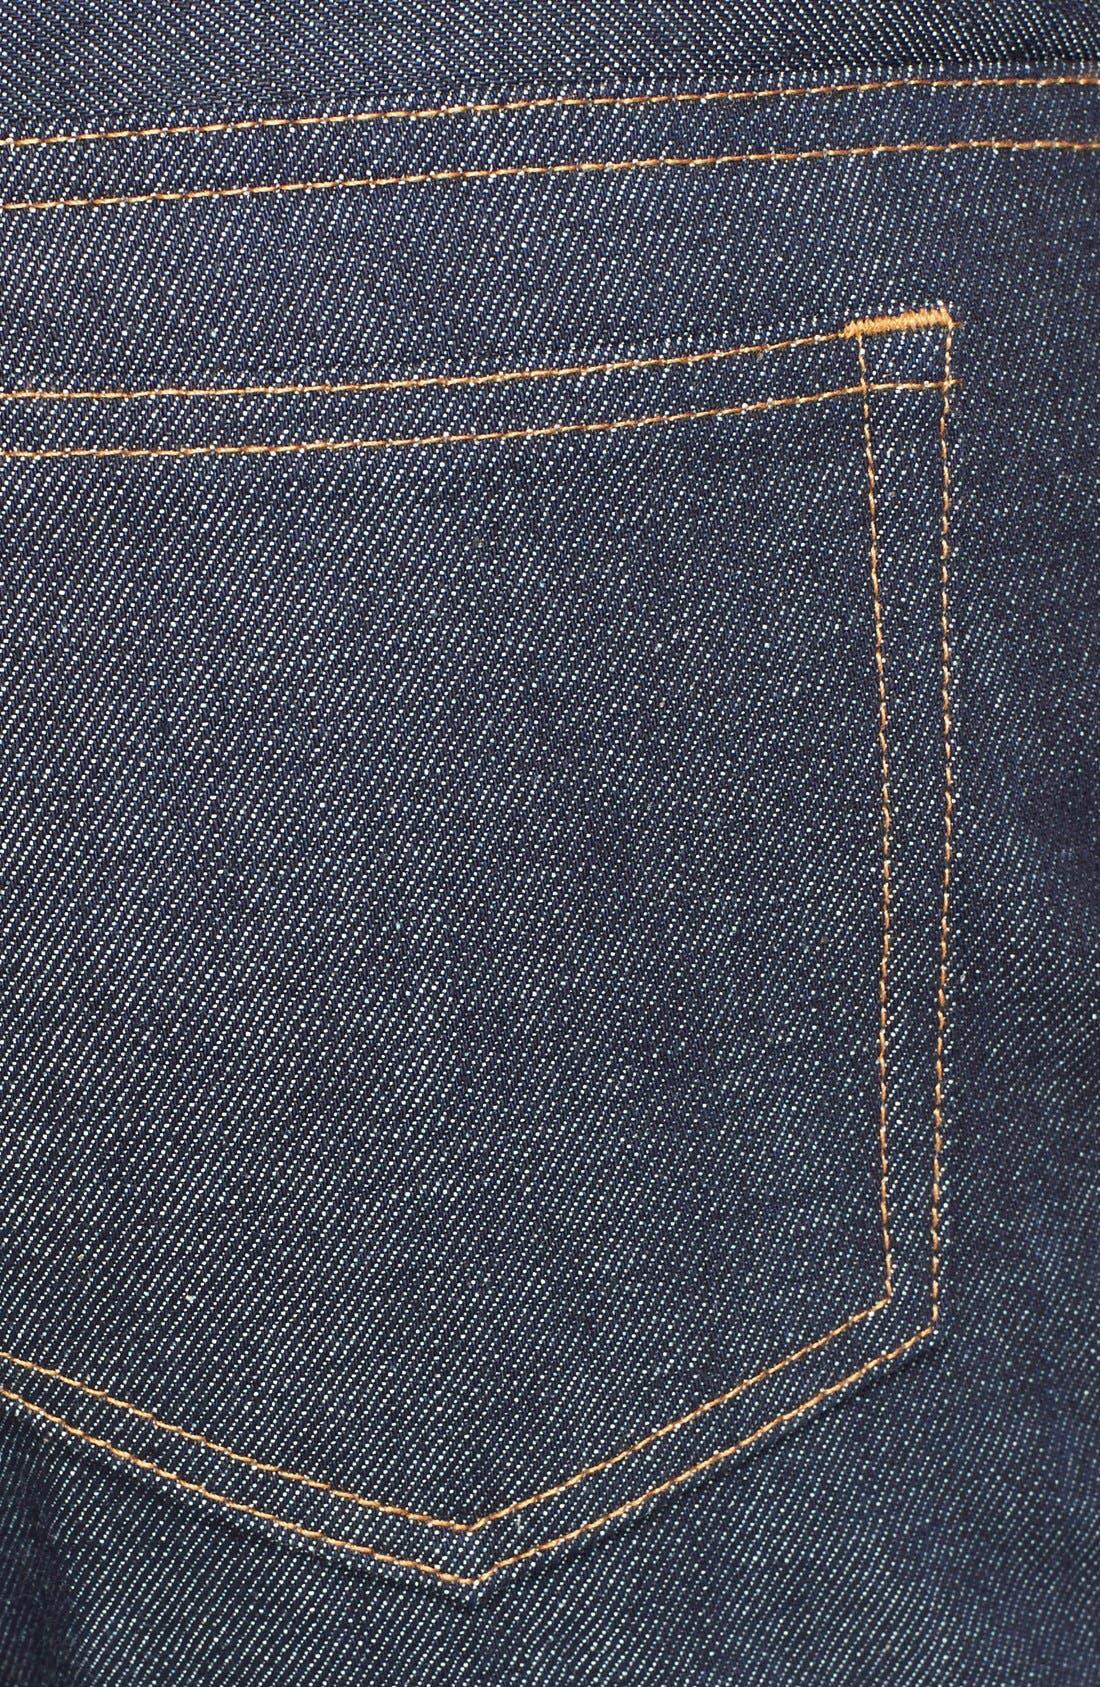 Alternate Image 4  - A.P.C. New Standard Slim Straight Leg Selvedge Jeans (Indigo)